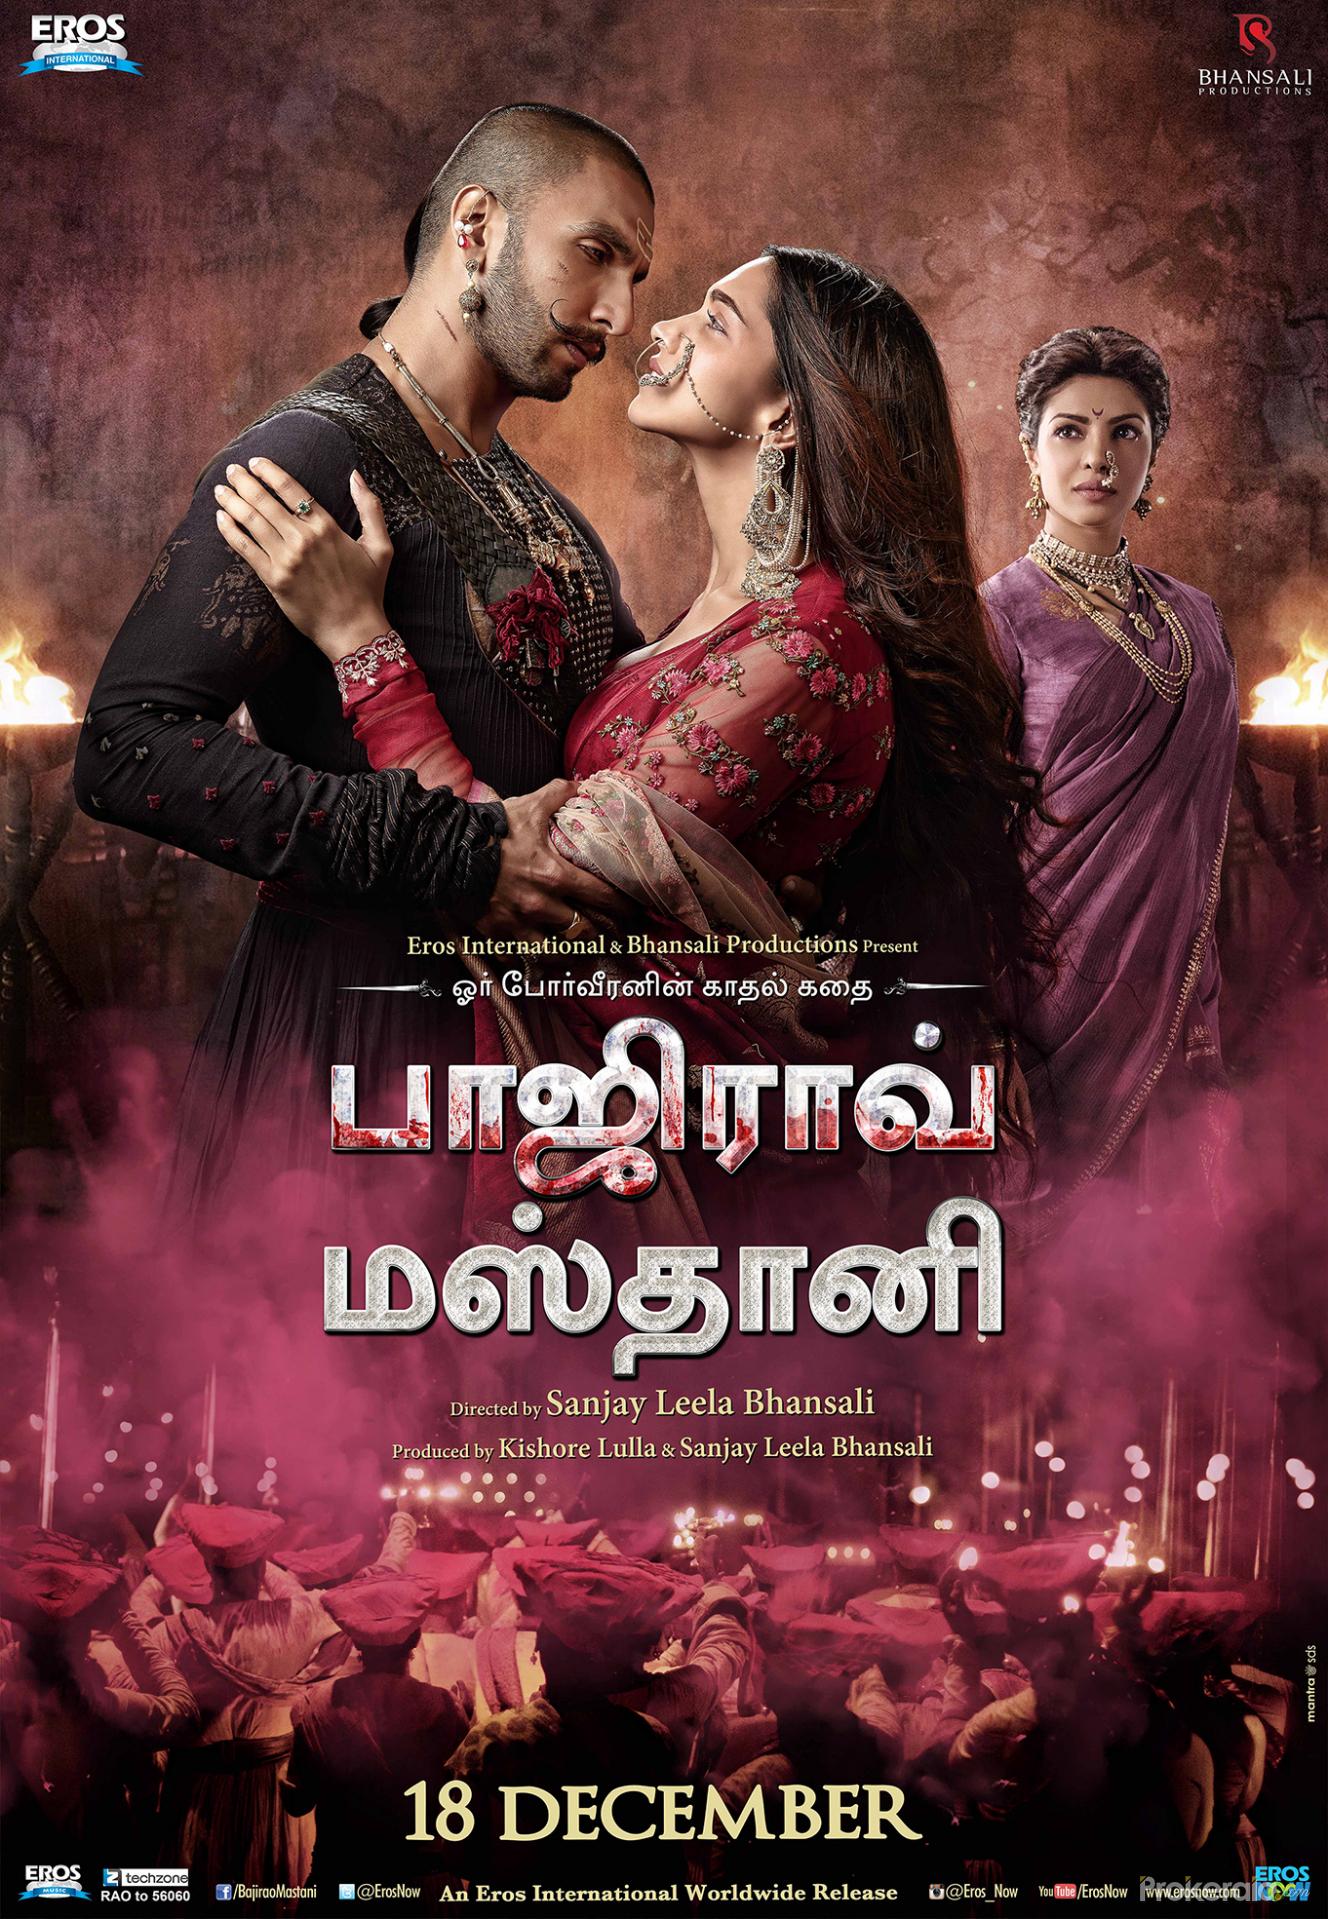 Best Wallpaper Movie Tamil - bajirao-mastani-tamil-movie-poster-48379  HD_134020.jpg